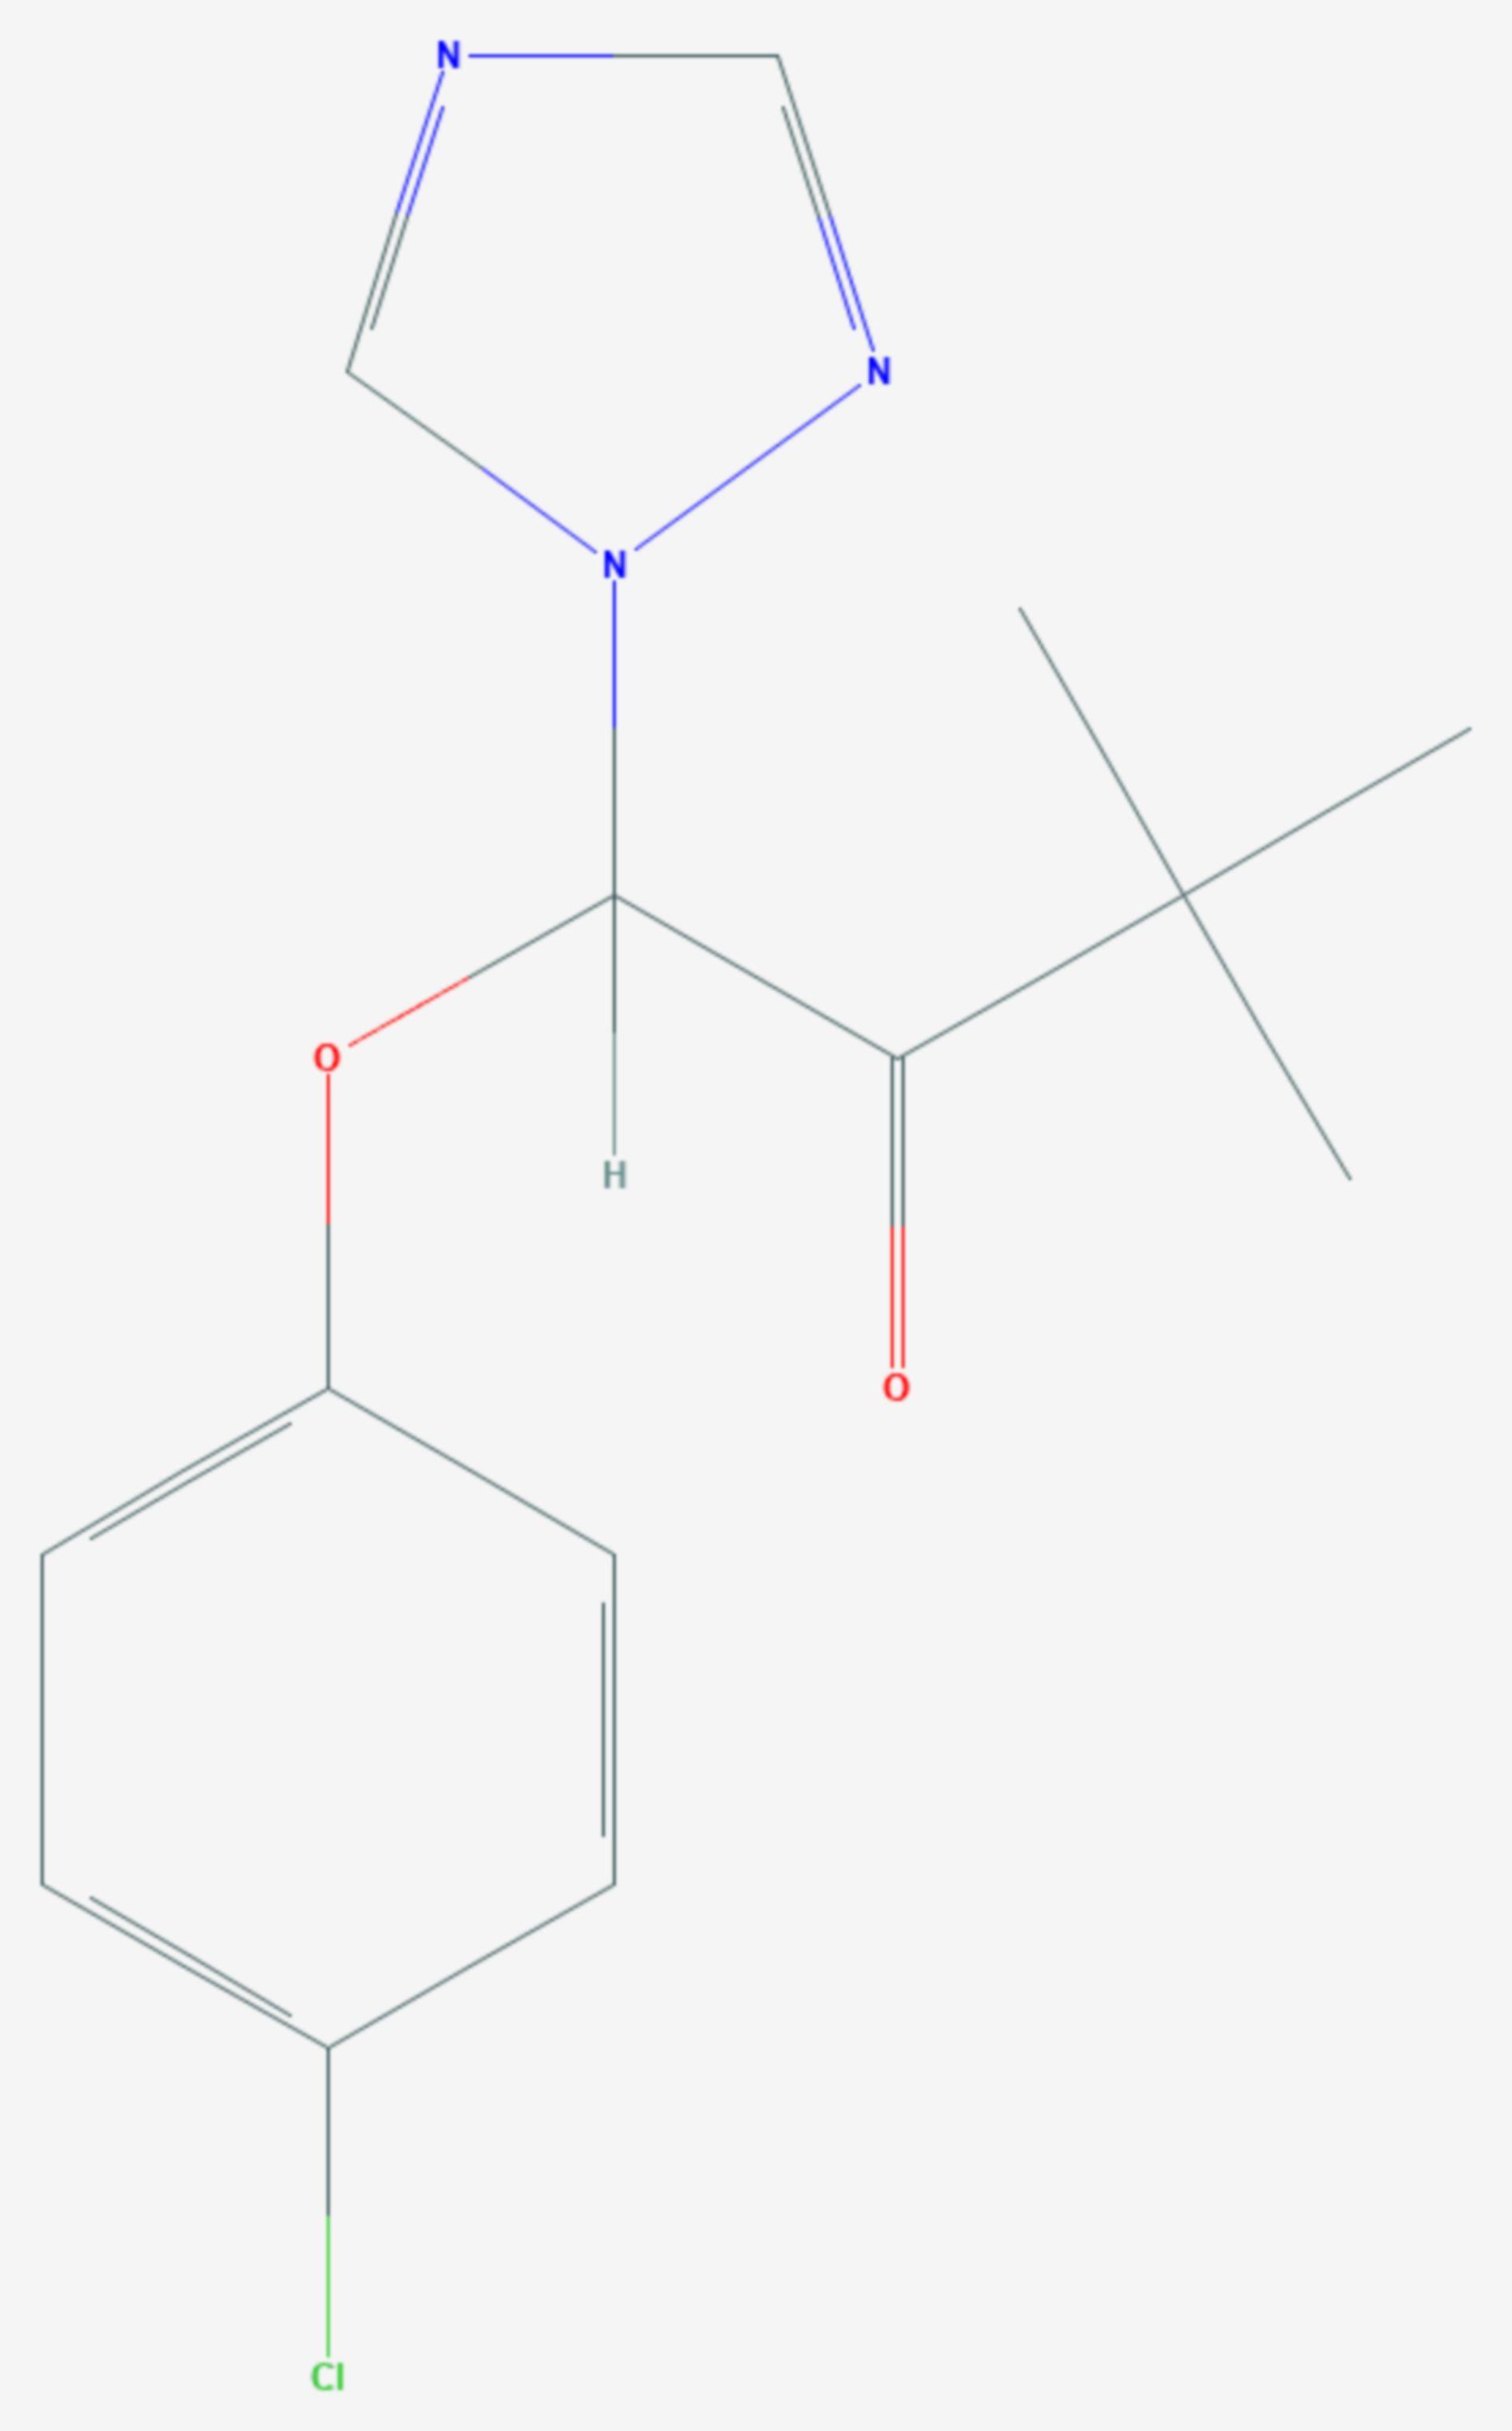 Triadimefon (Strukturformel)